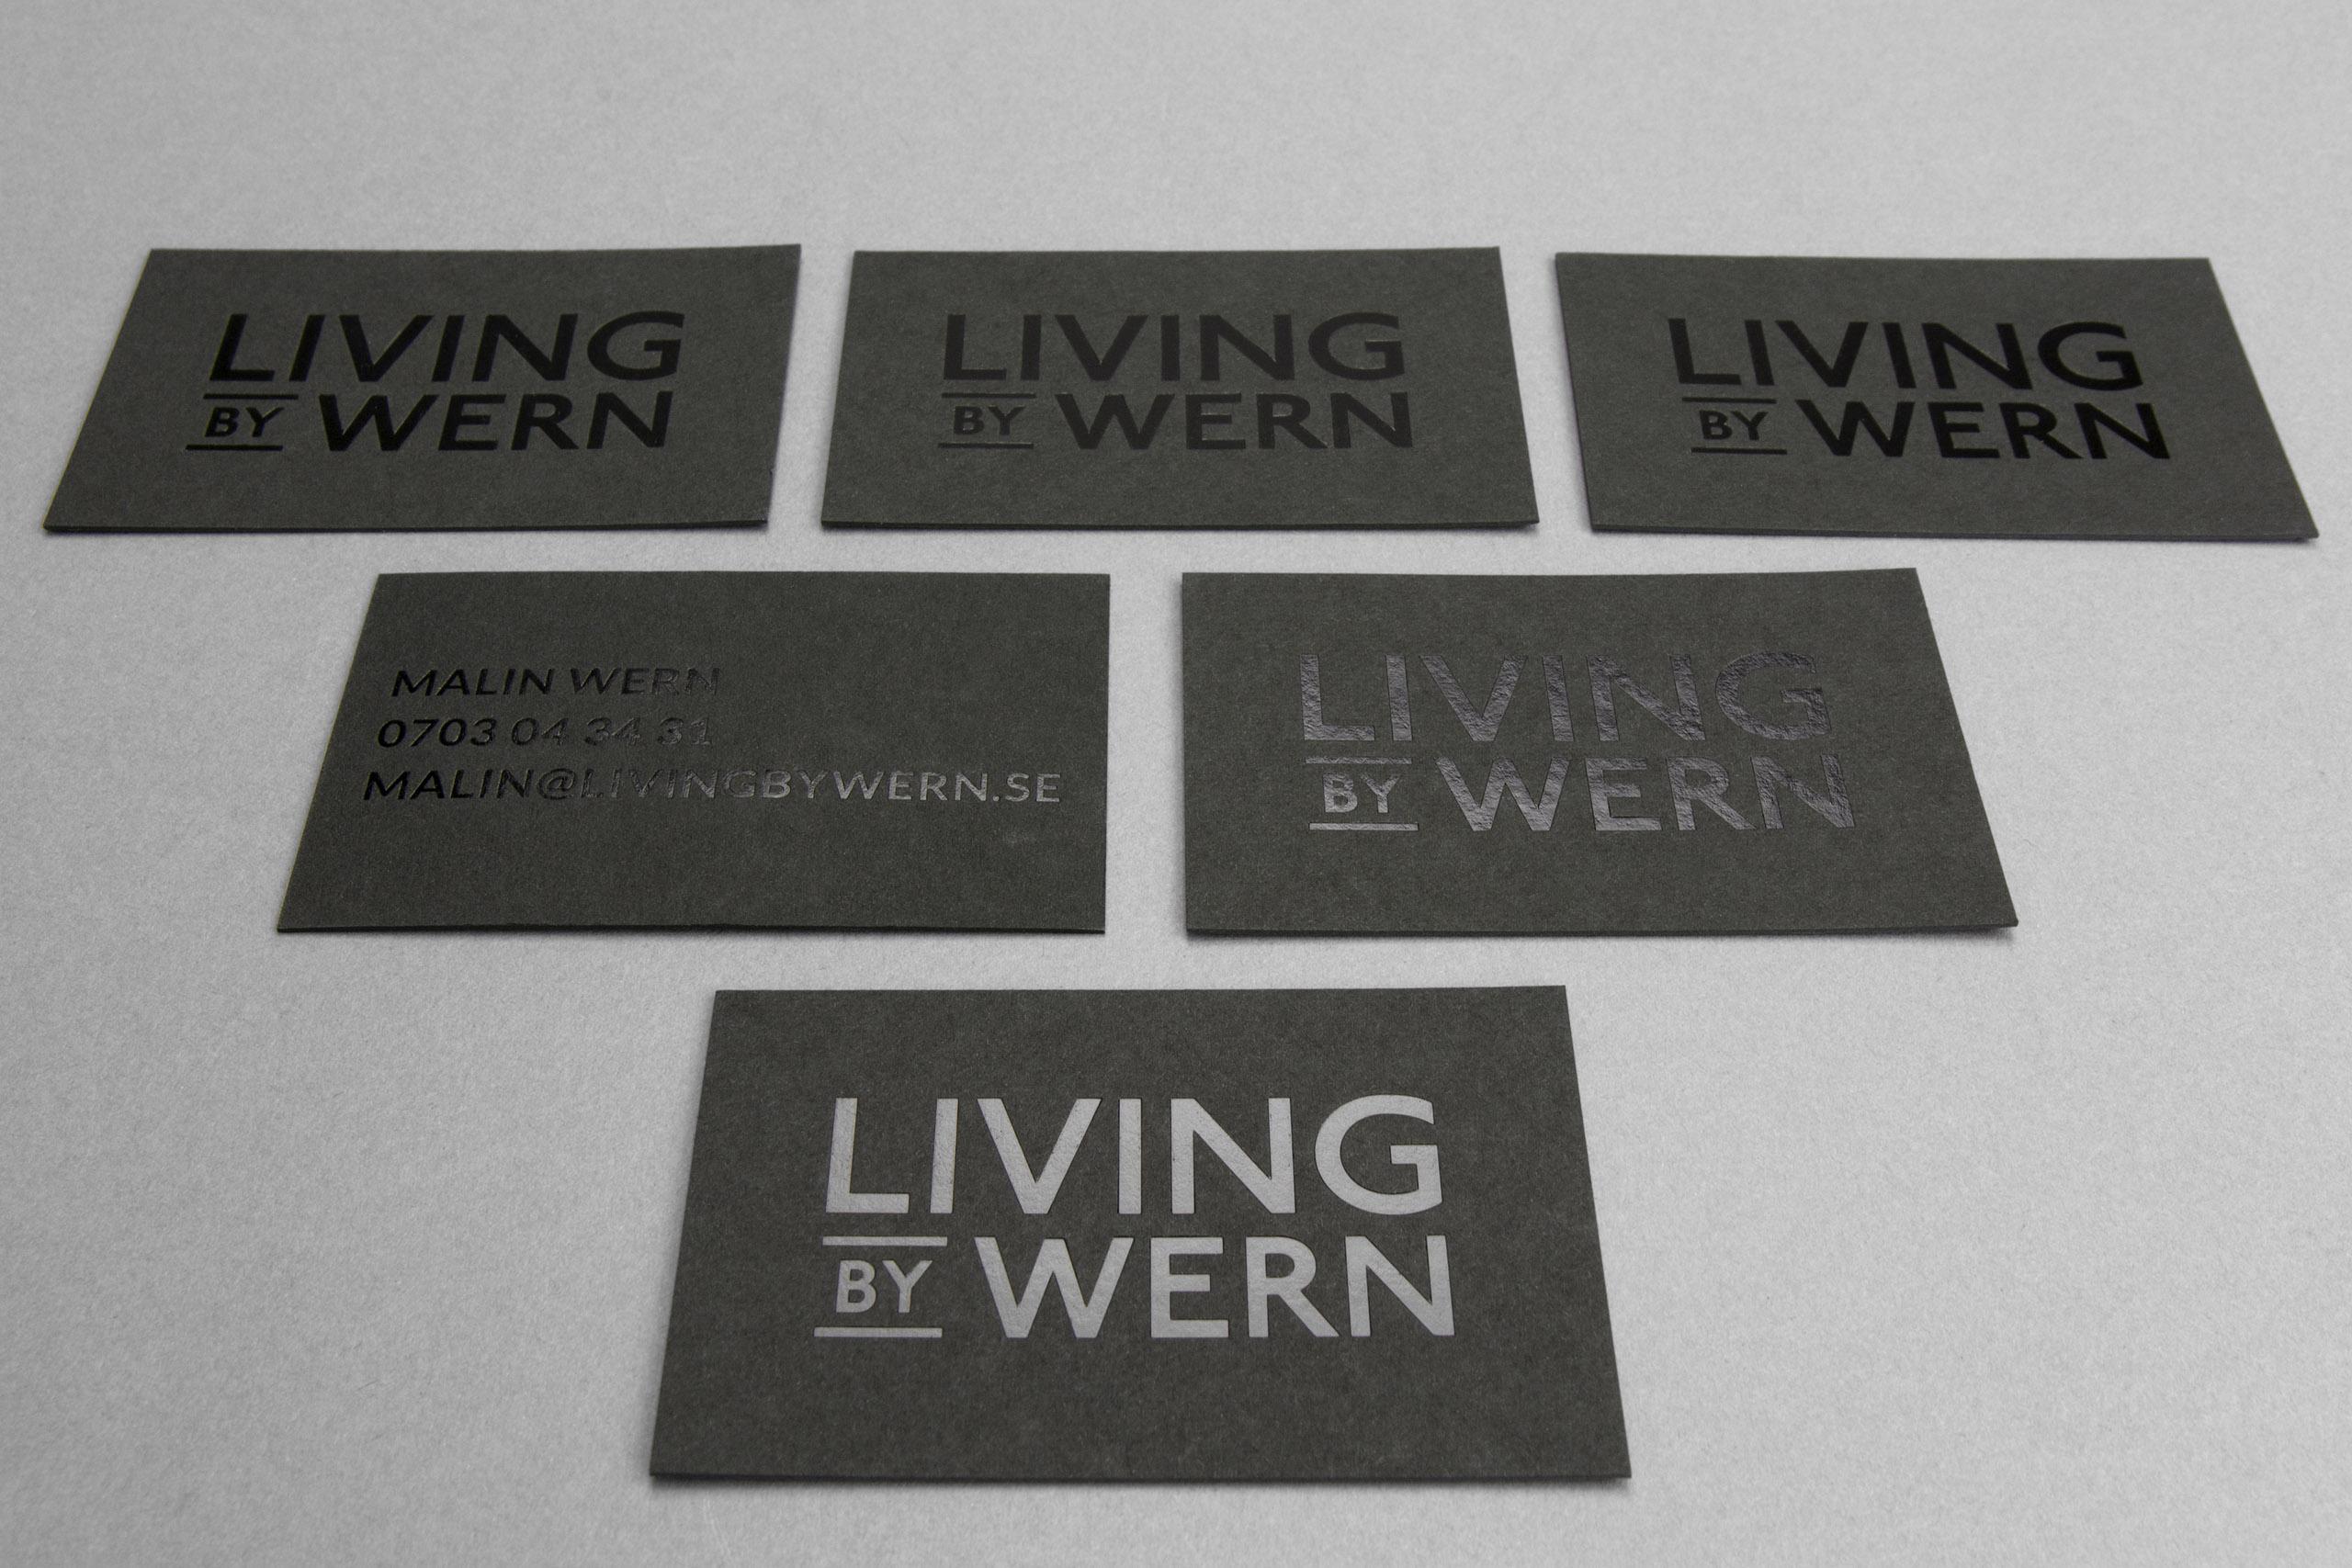 Living-by-wern-visitkort1